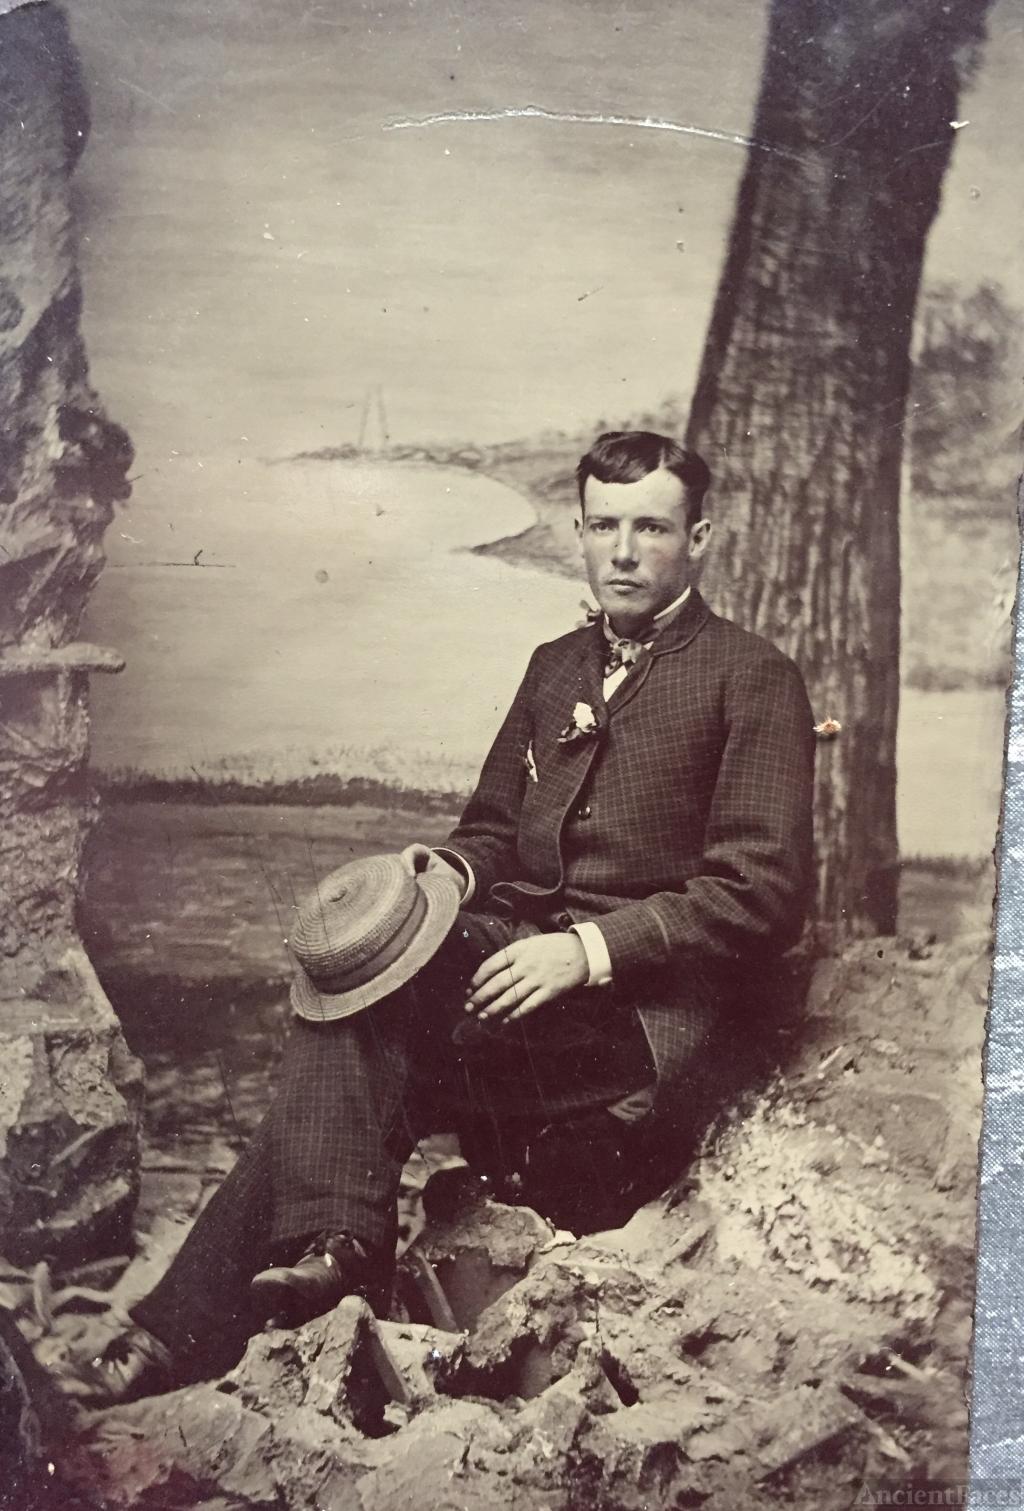 Unknown Tintype man